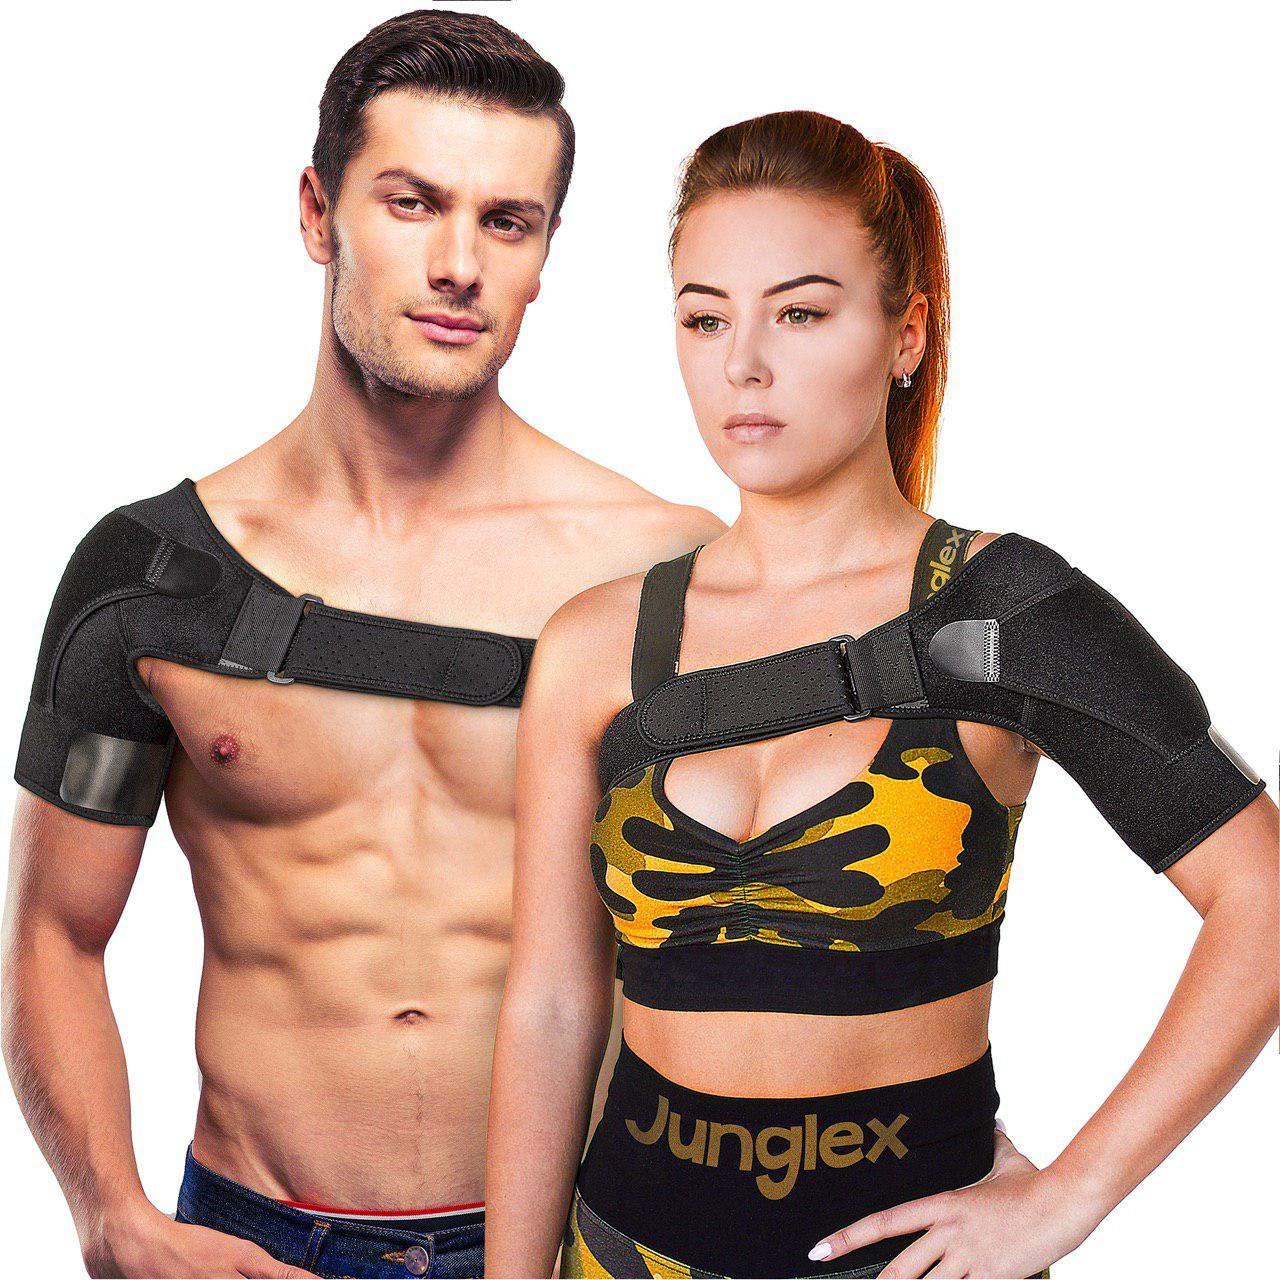 Junglex Shoulder Support Brace for Women and Men - 100% Adjustable Shoulder Sling for Torn Rotator Cuff, Stability and Compression Sleeve - Immobilizer Strap by Junglex